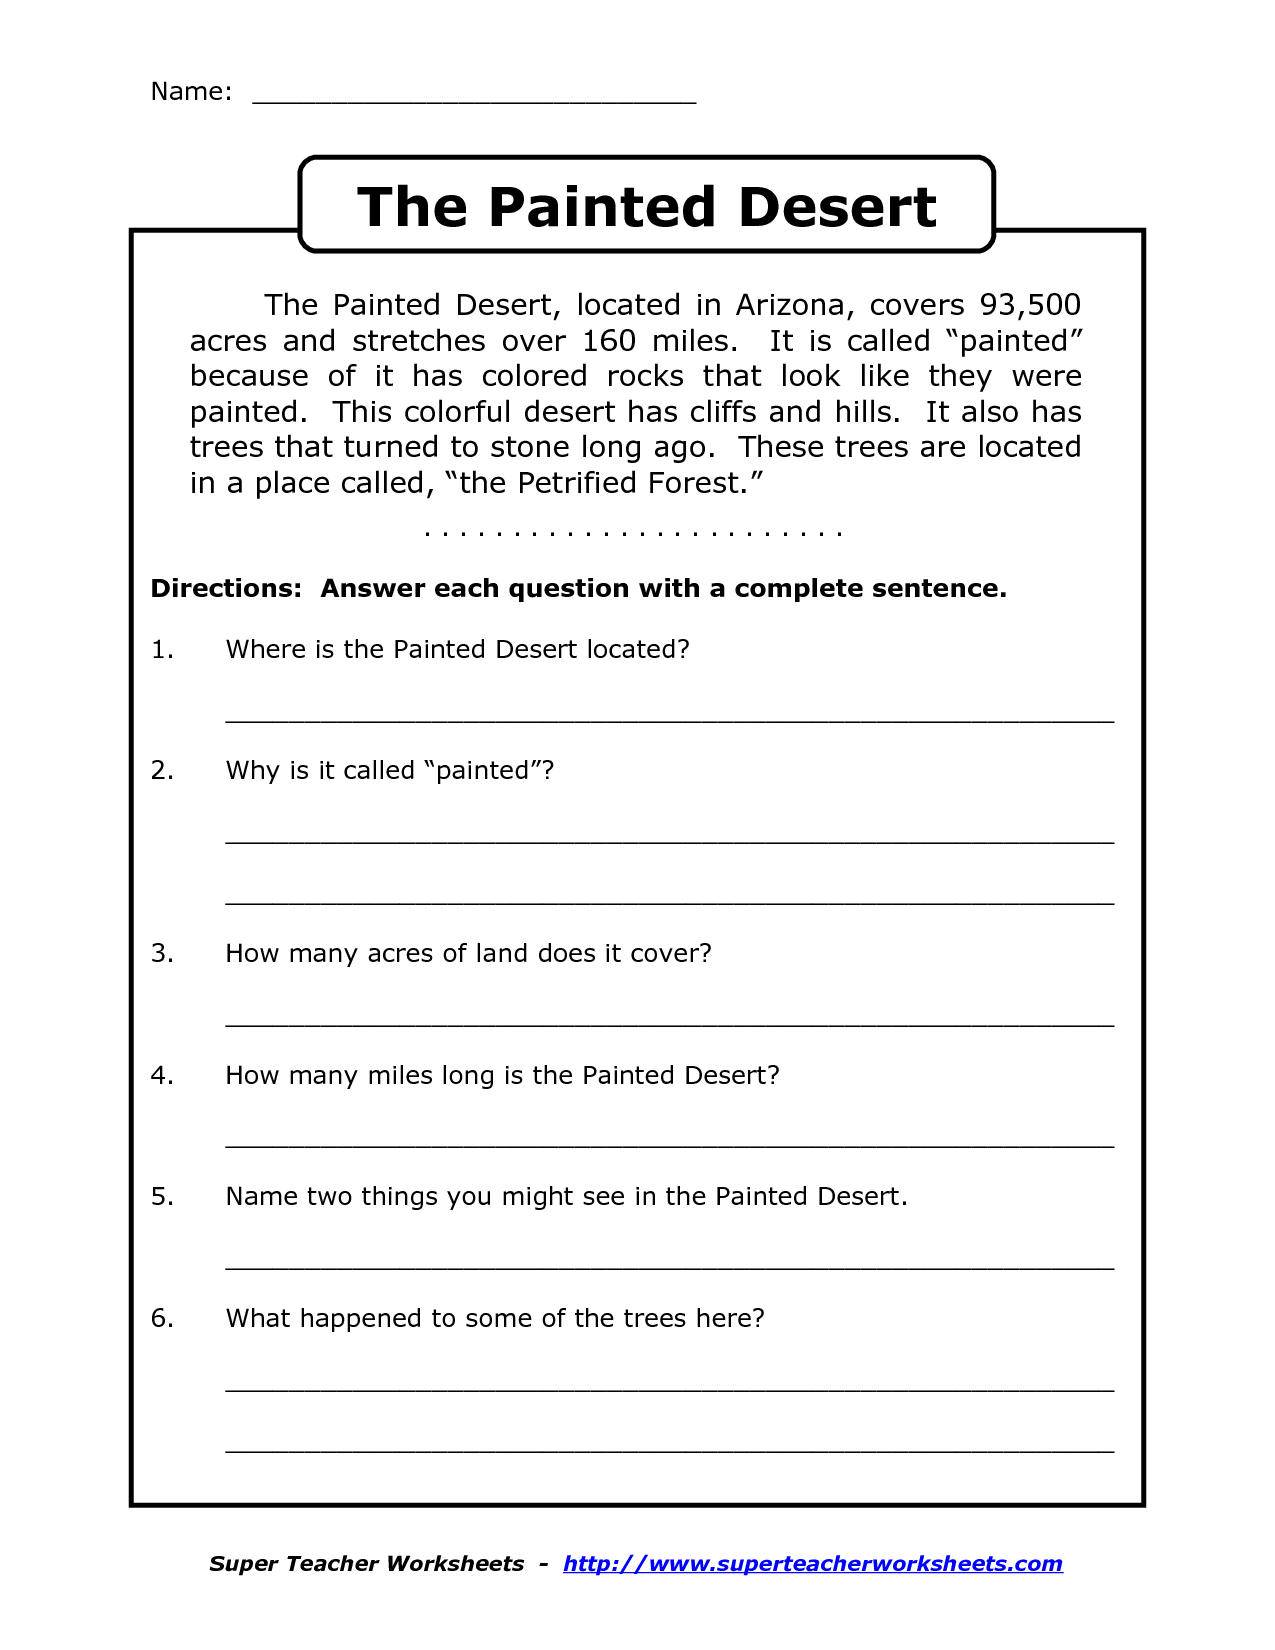 Reading Worksheets For 4Th Grade | Reading Comprehension Worksheets | Free Printable Comprehension Worksheets For Grade 5